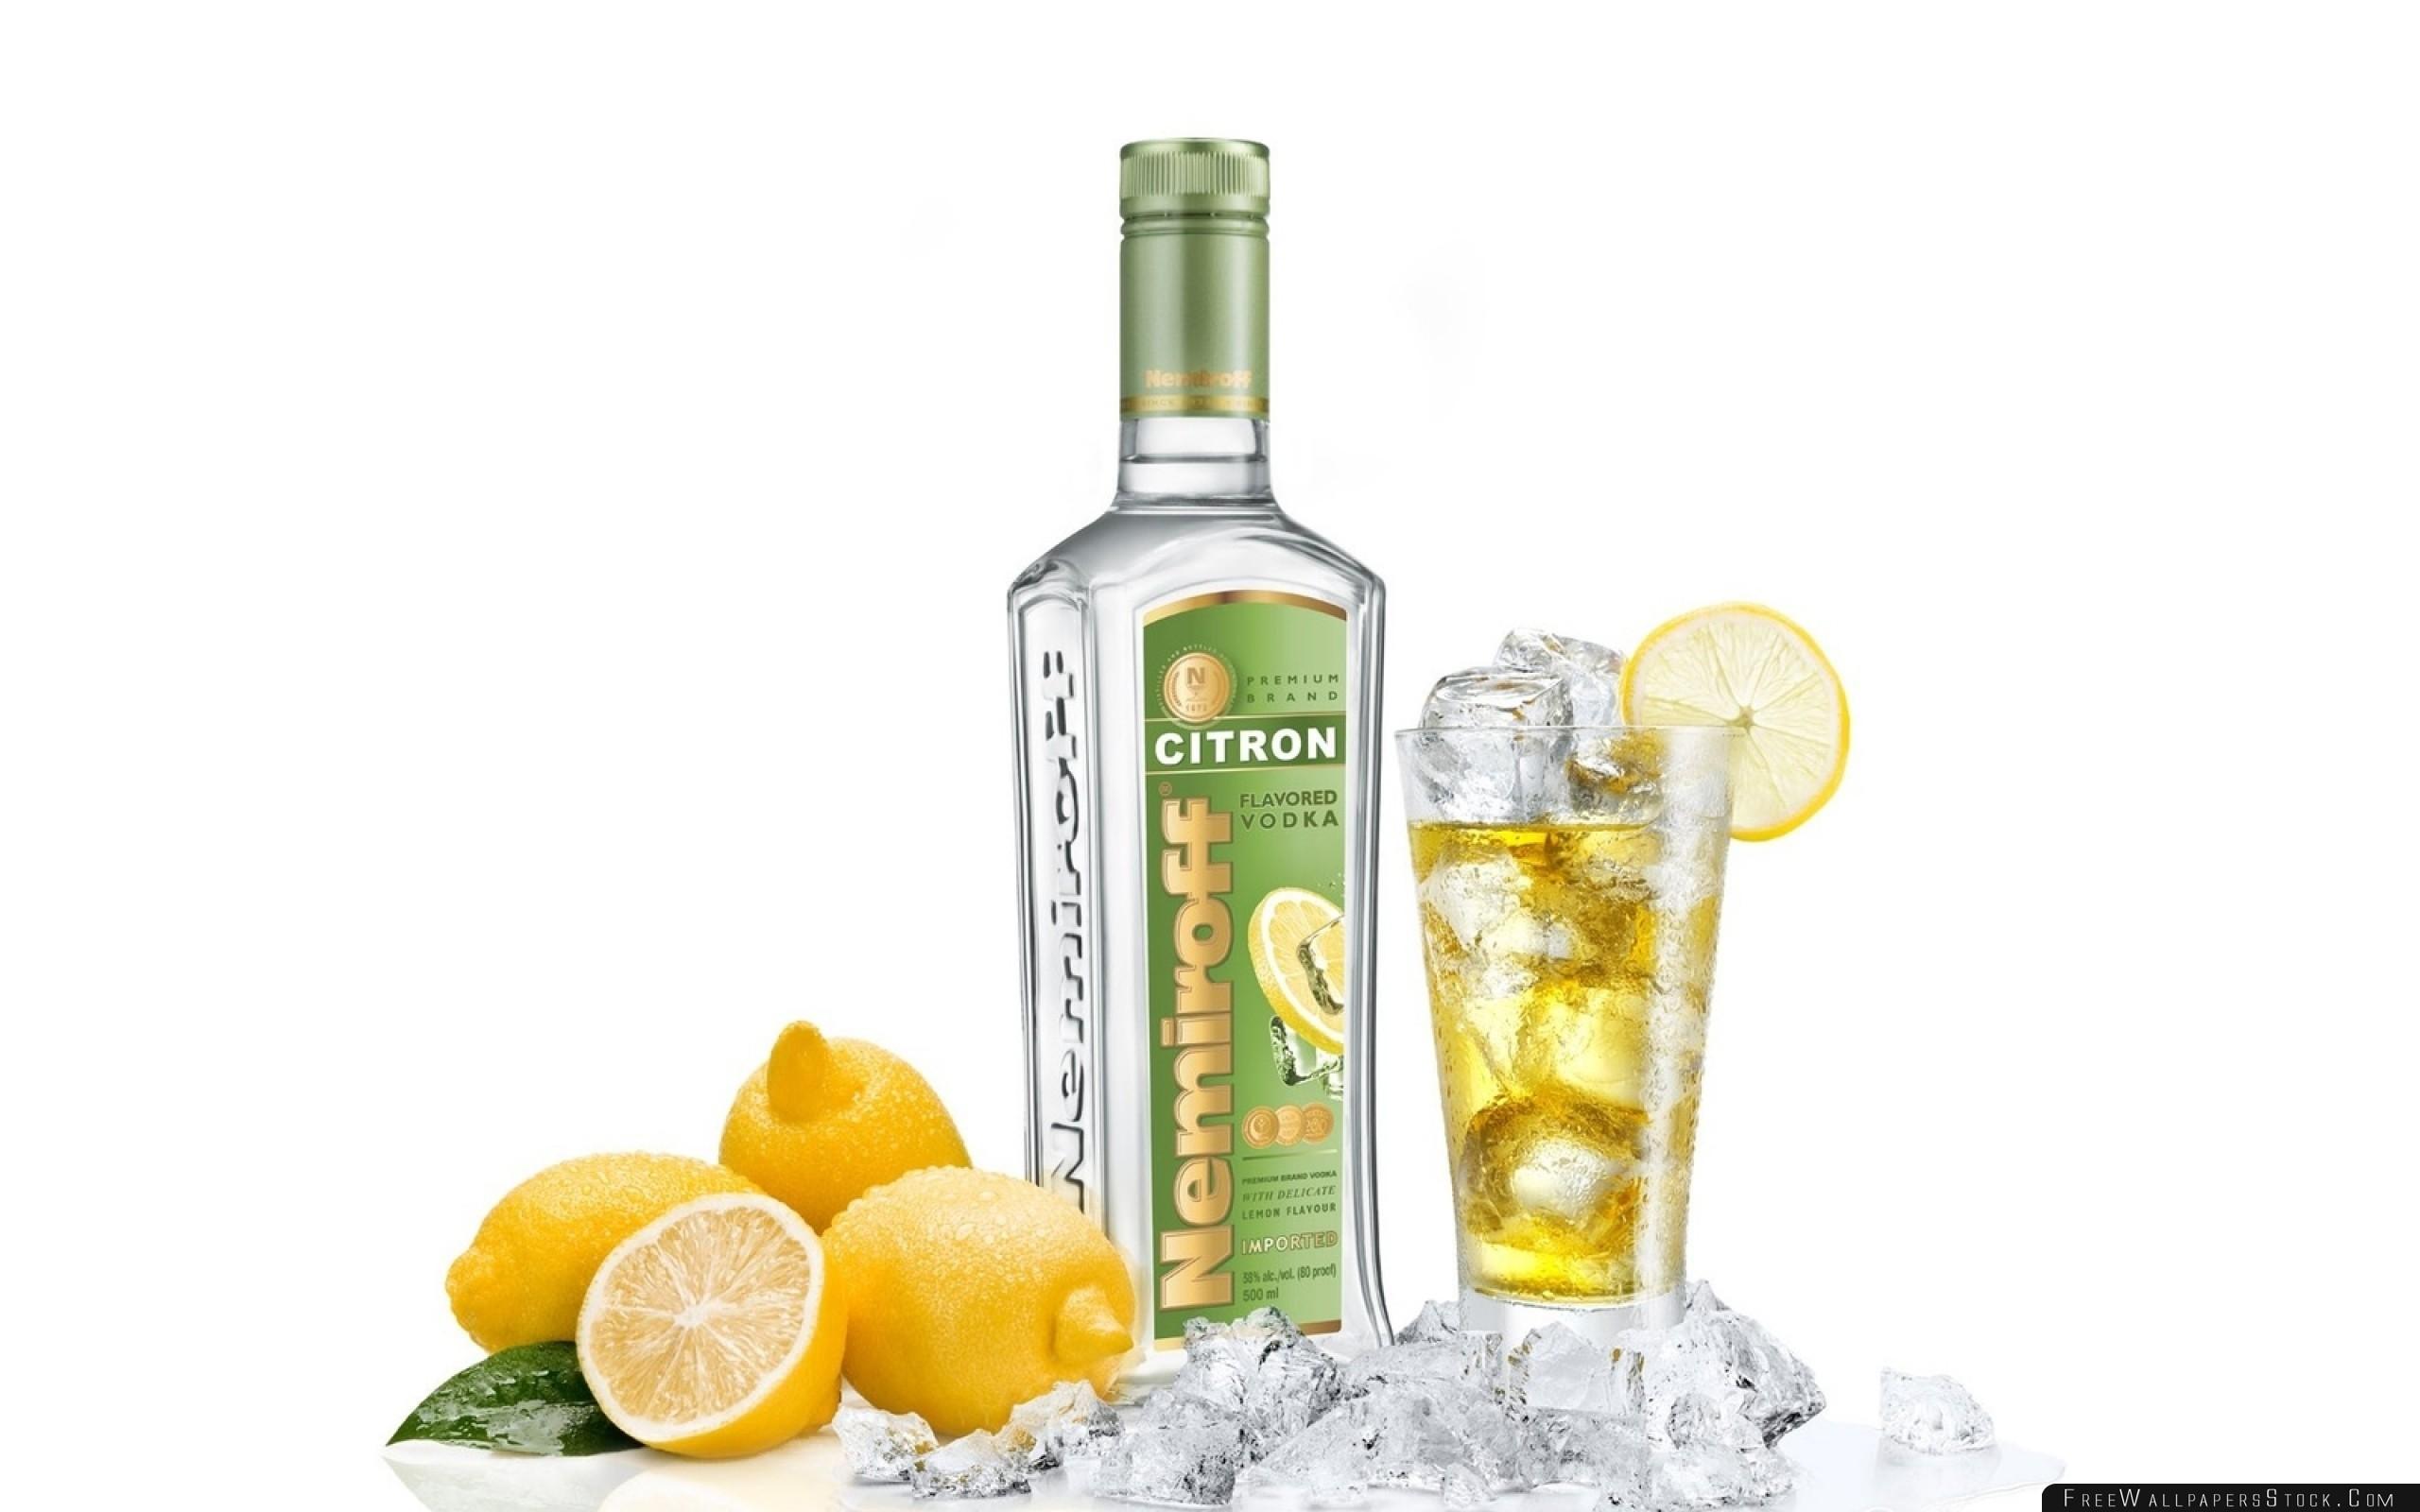 Download Free Wallpaper Vodka Bottle Lemon Alcohol Glass Ice